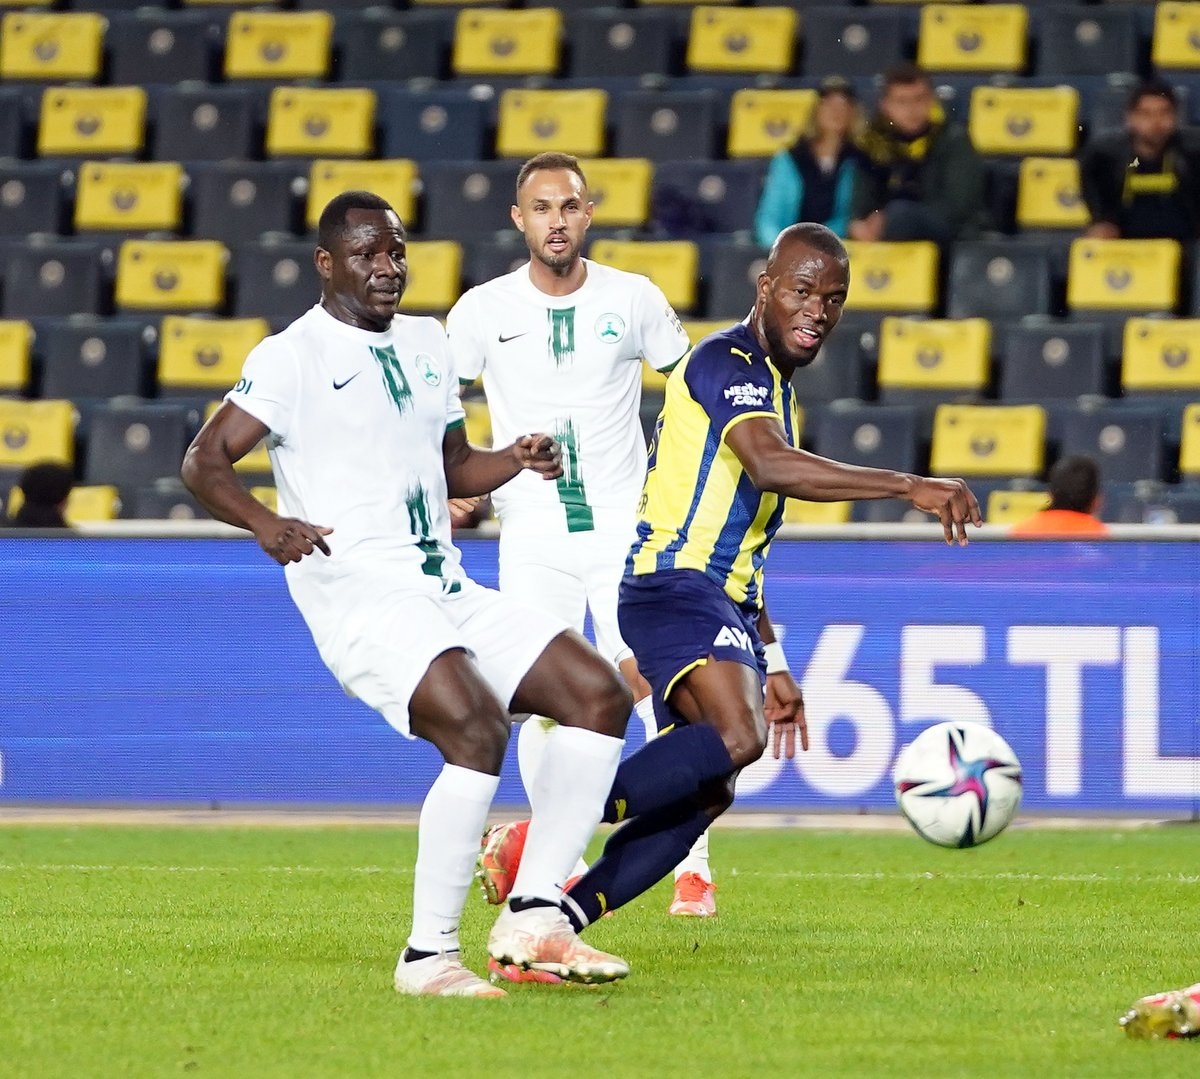 Fenerbahçe, Giresunspor u 2 golle geçti #5